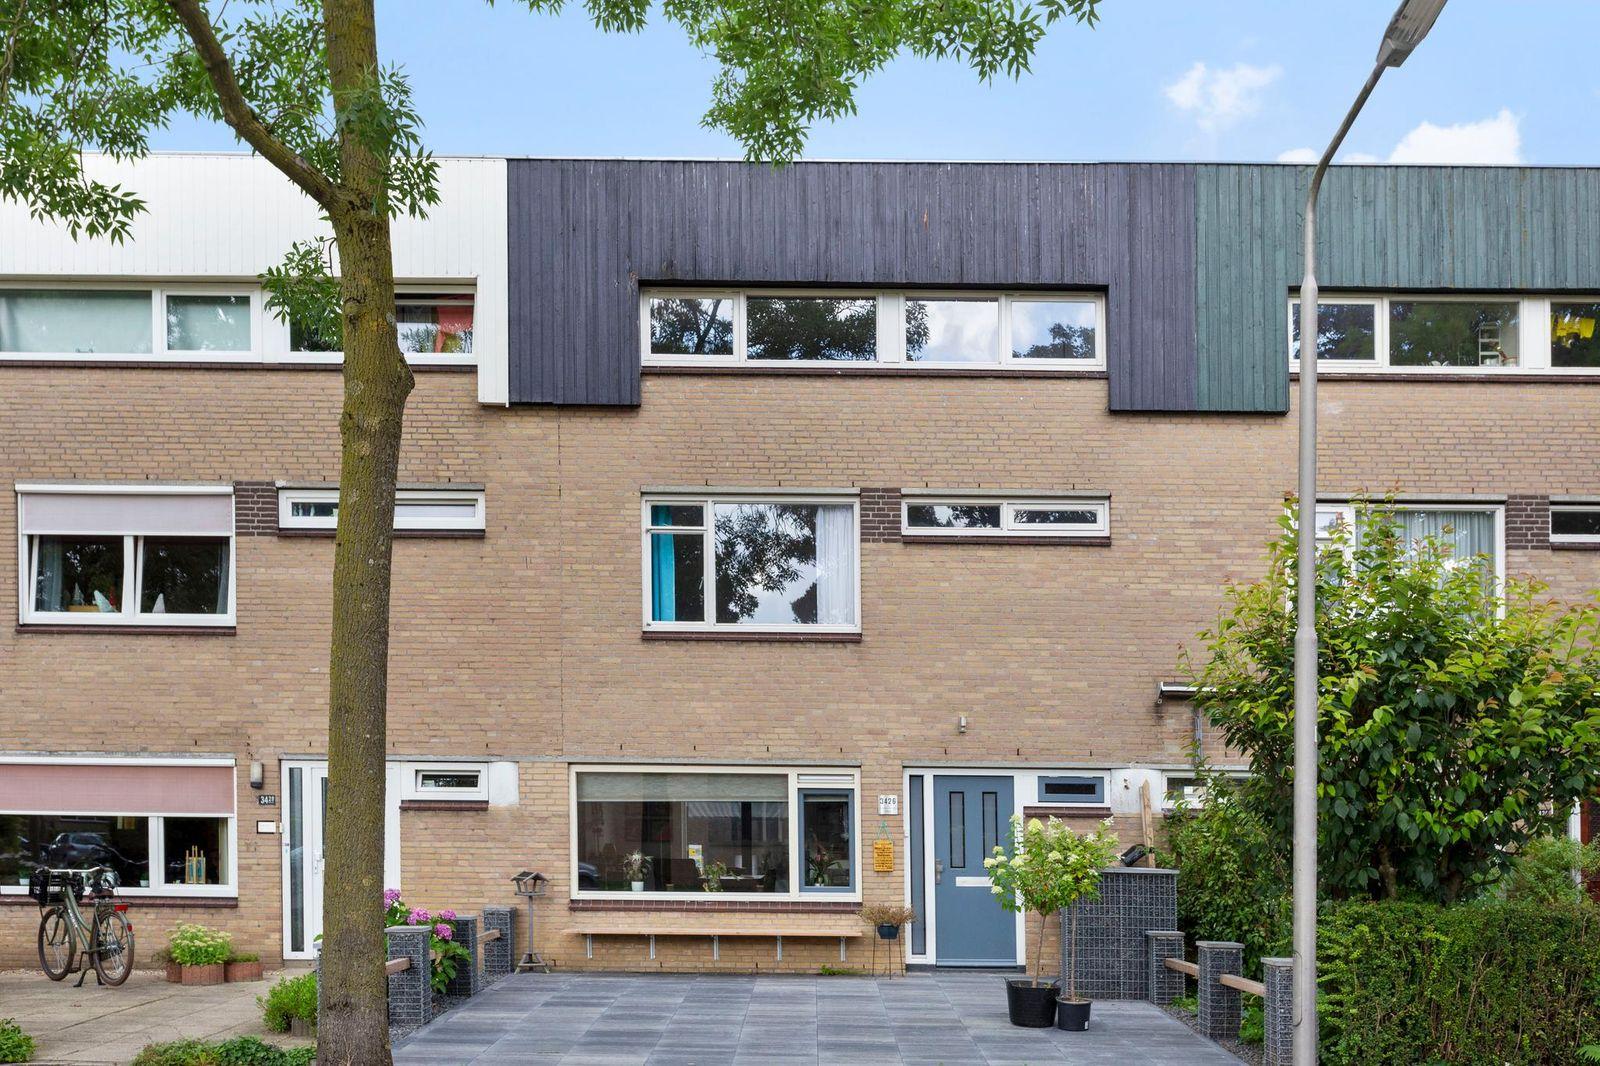 Tolhuis 3426, Nijmegen